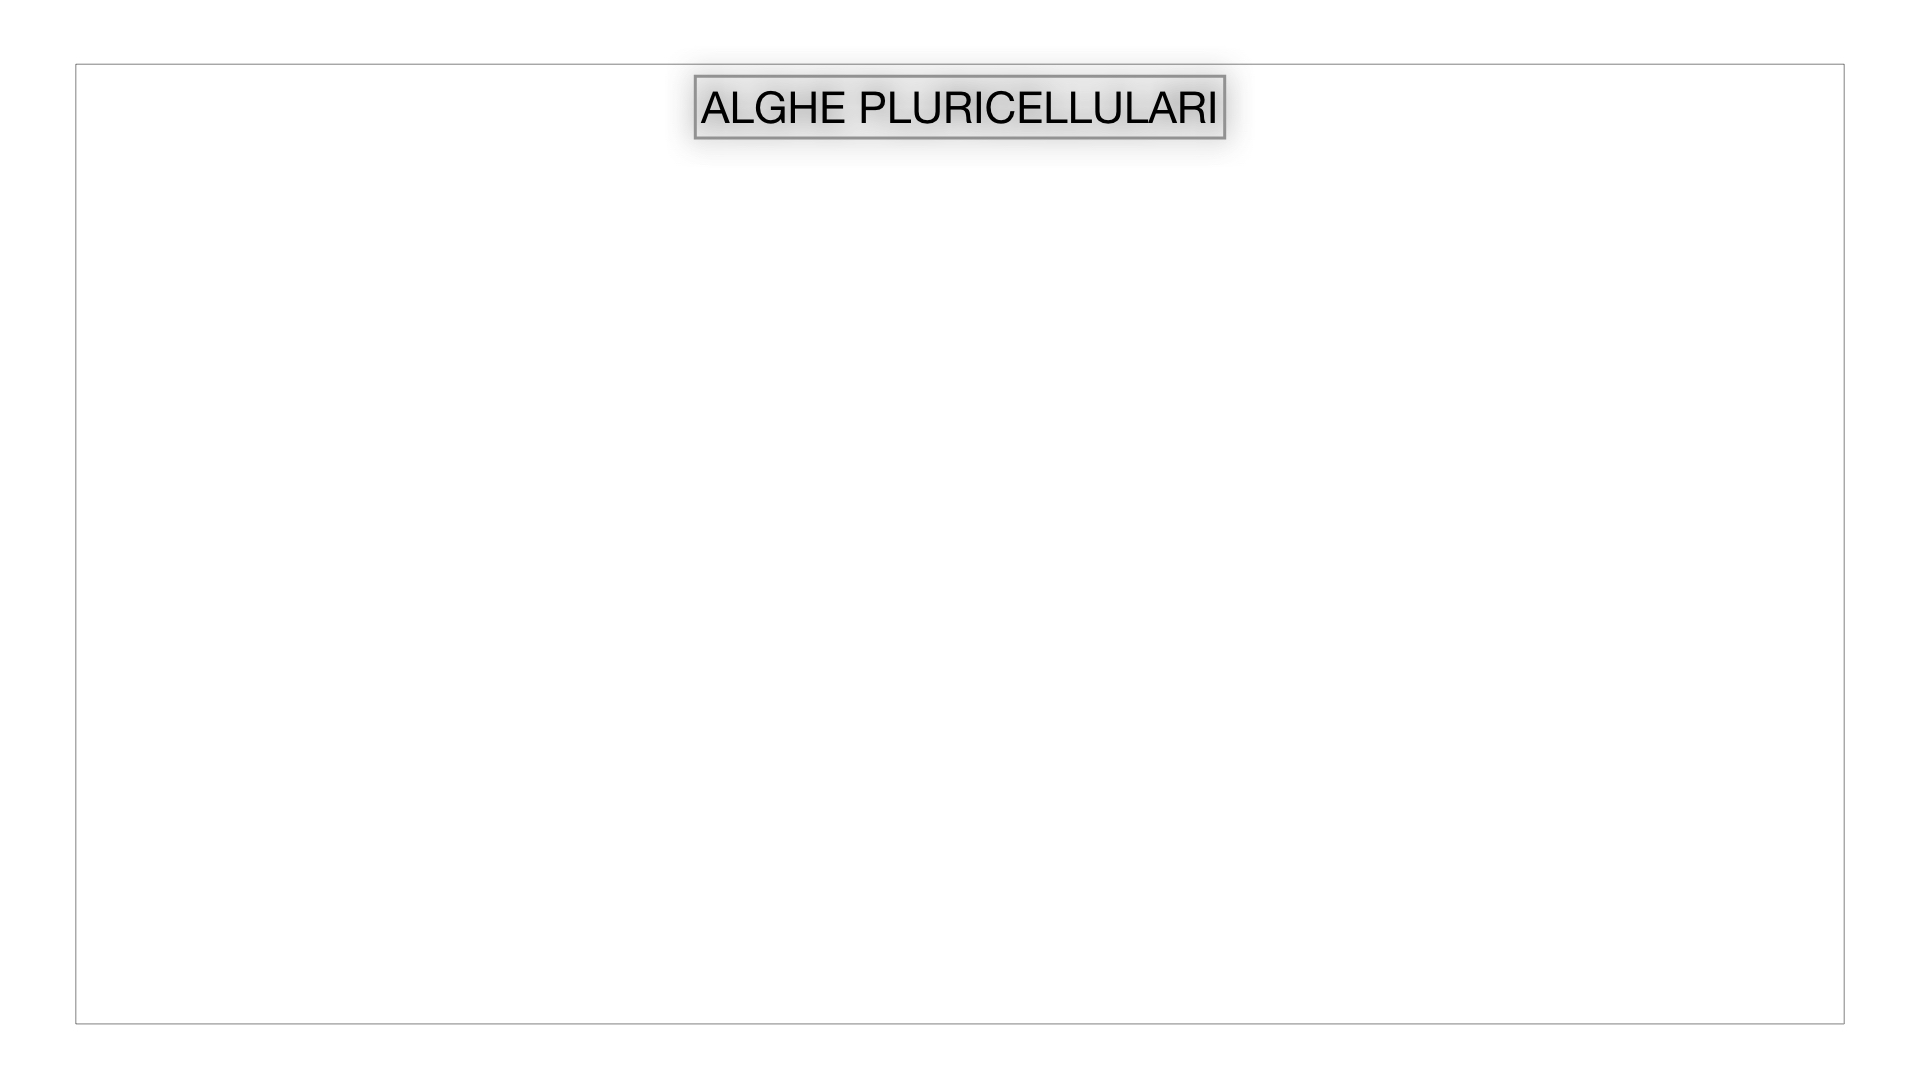 8. alghe uni_pluri_cellulari_SIMULAZIONE.042